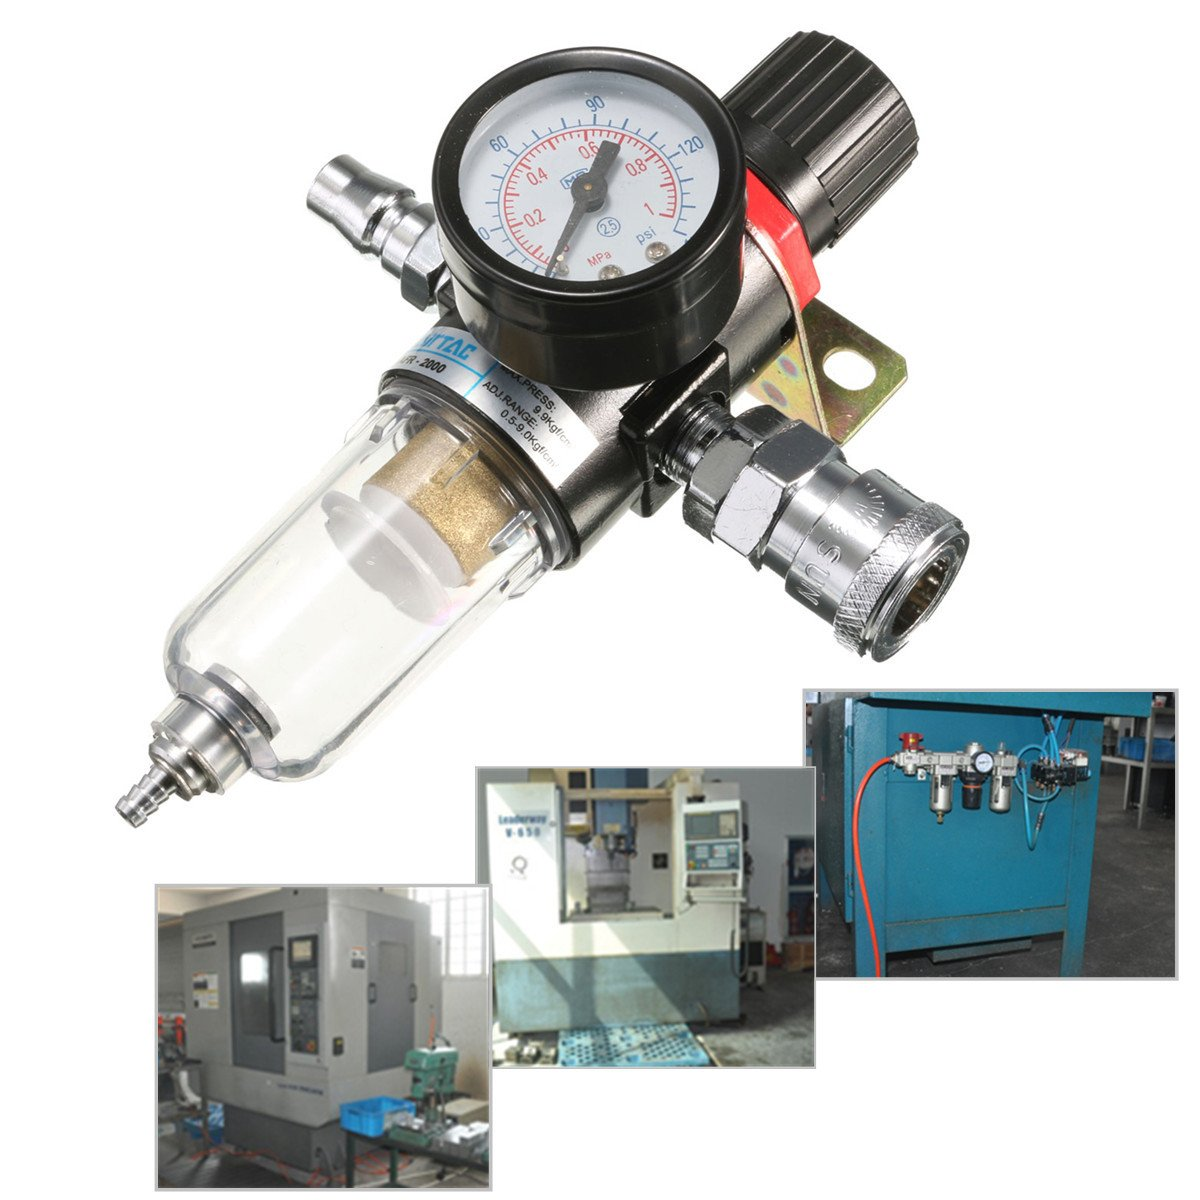 QOJA afr-2000 1/4'' air compressor filter water separator trap by QOJA (Image #3)